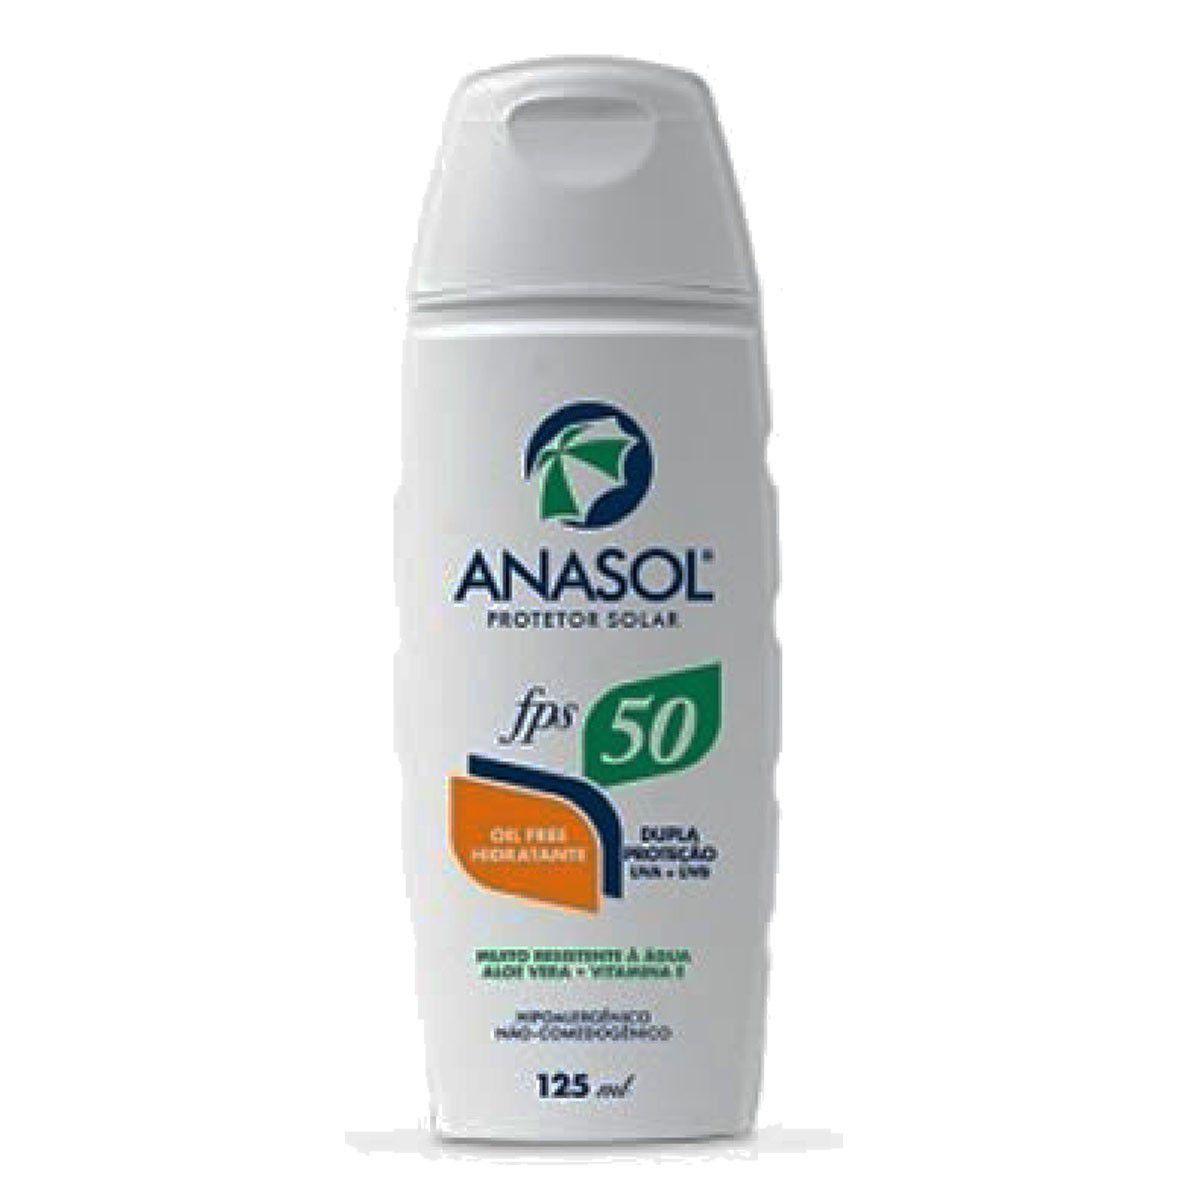 Kit 3 Und Protetor Solar Anasol Fps 50 Oil Free Hipoalergênico 200 ml